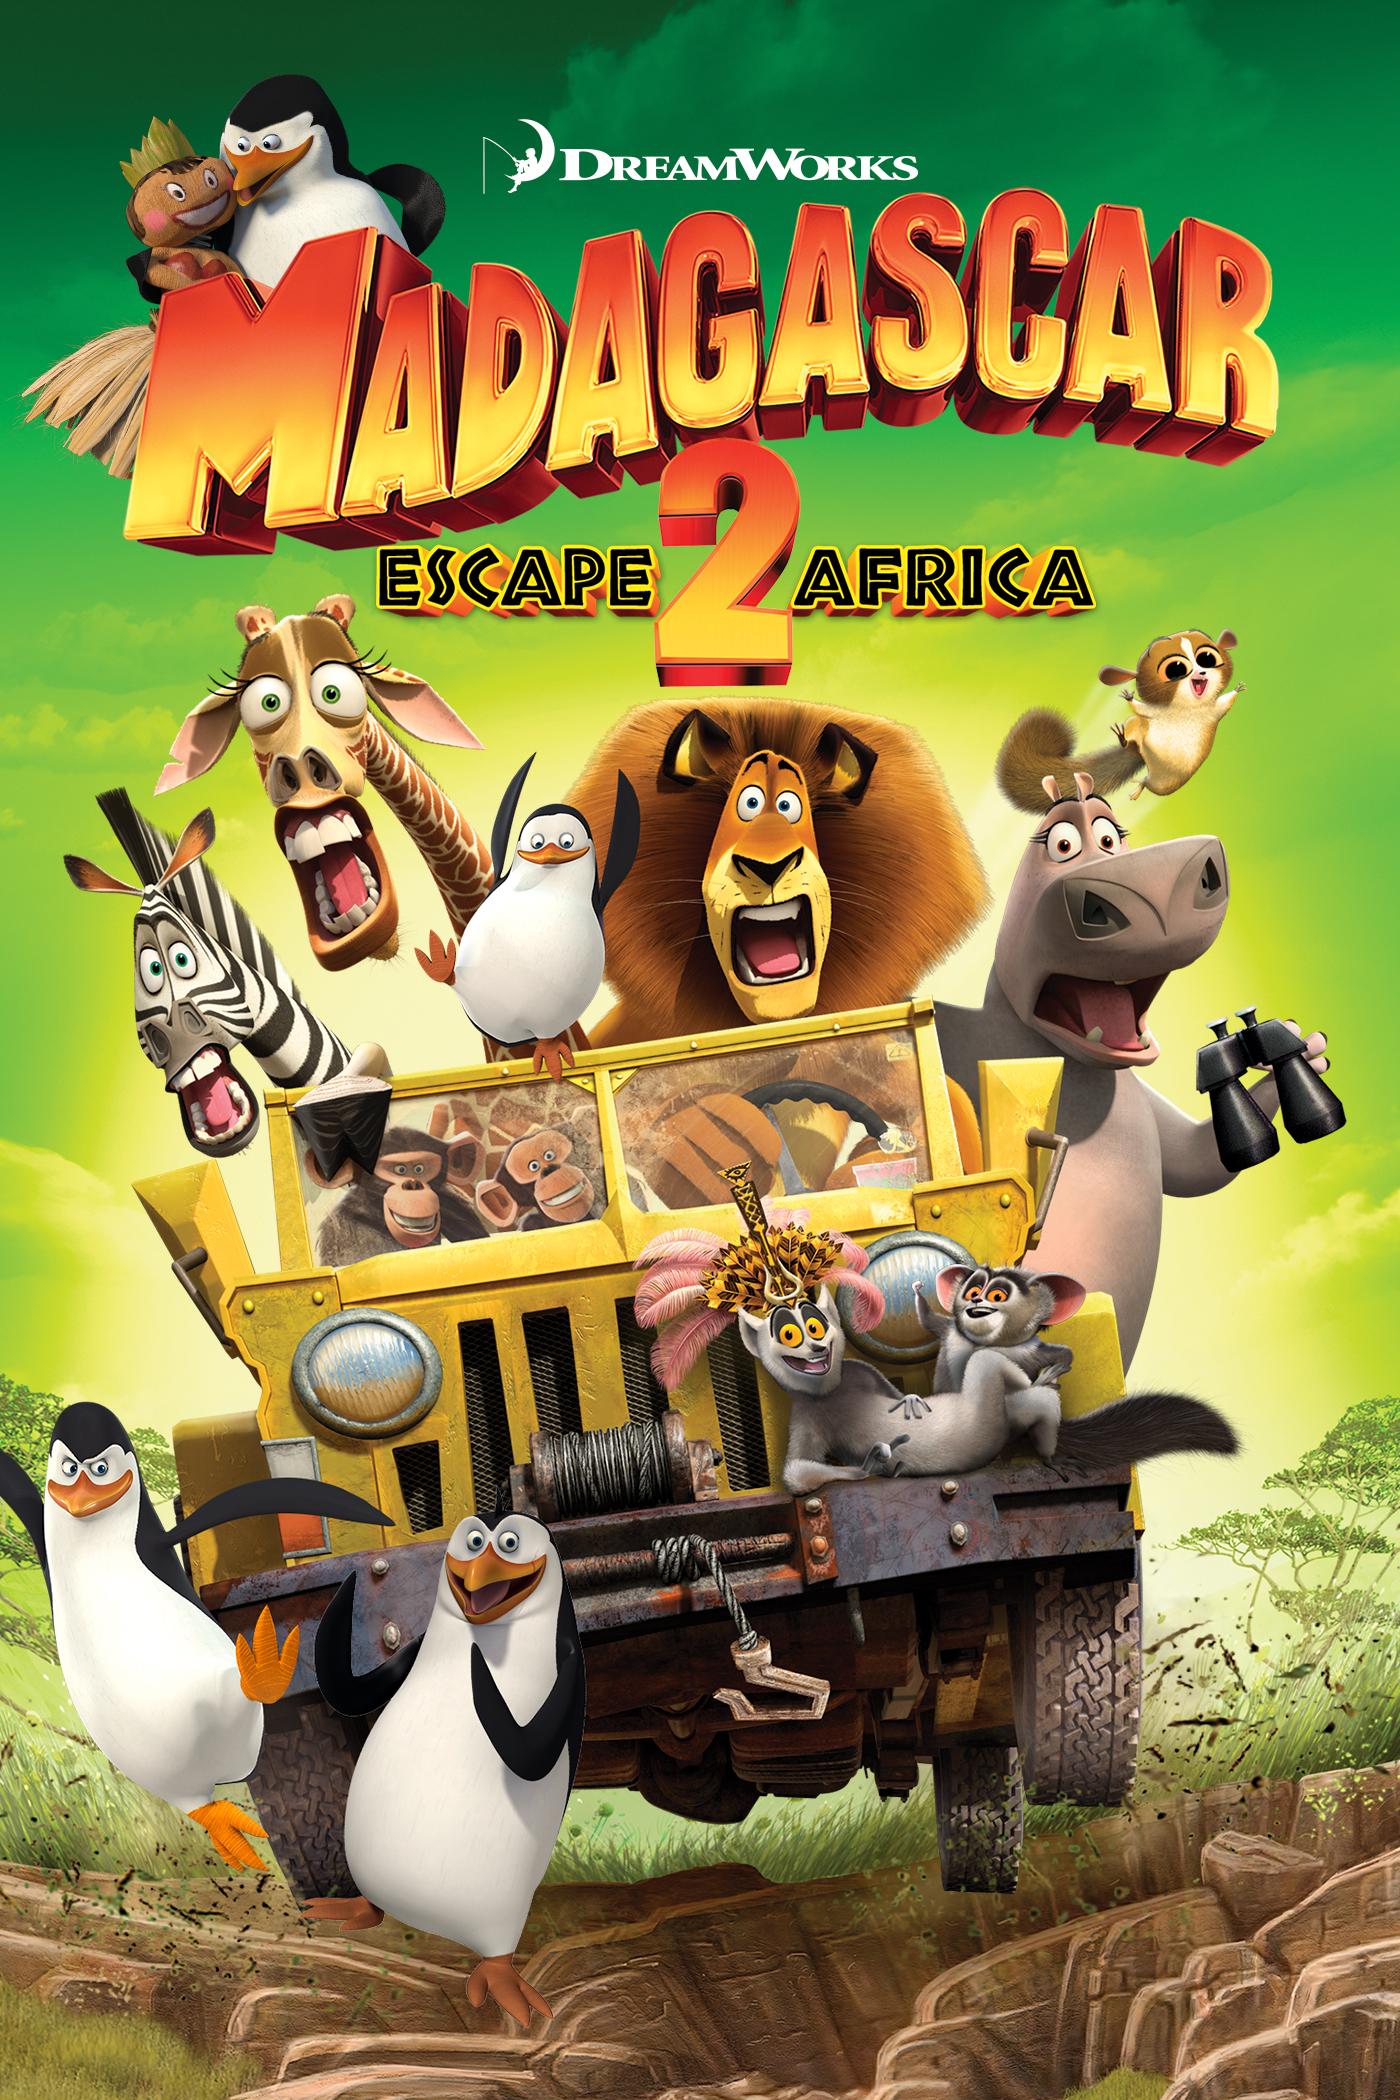 Madagascar Escape 2 Africa Home Video Dreamworks Animation Wiki Fandom